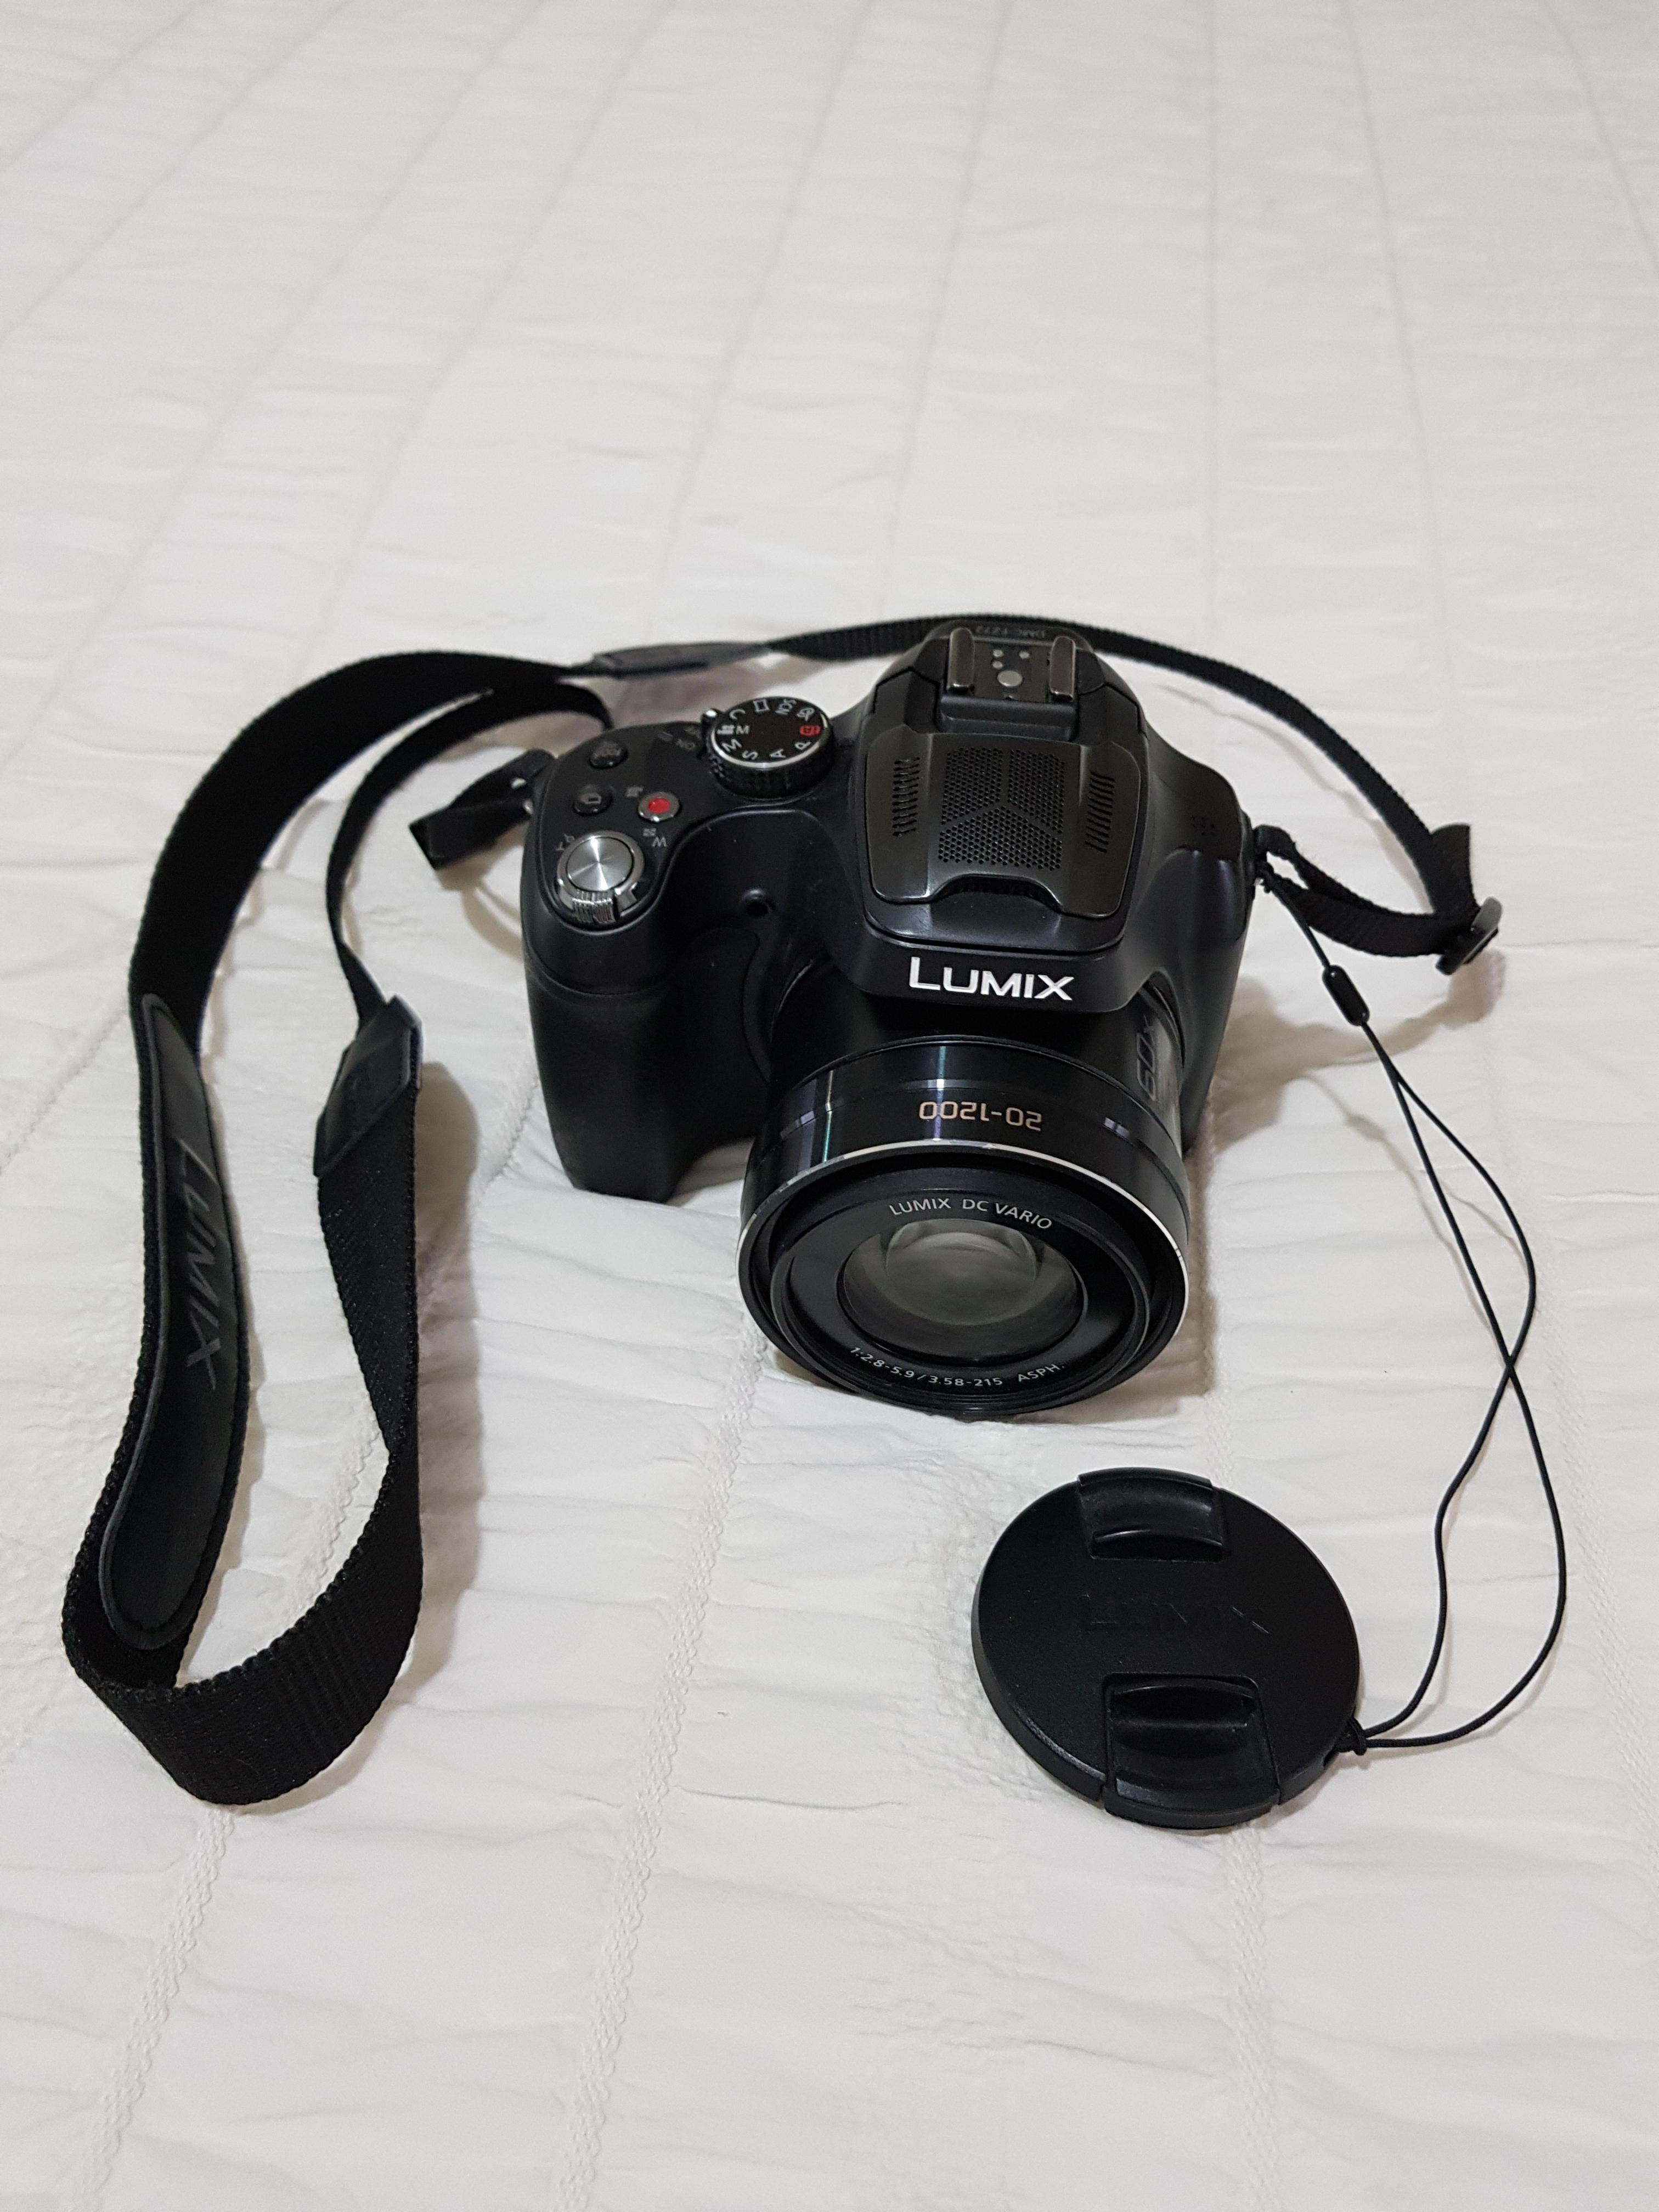 For sale, Panasonic Lumix FZ72 digital camera, boxed with